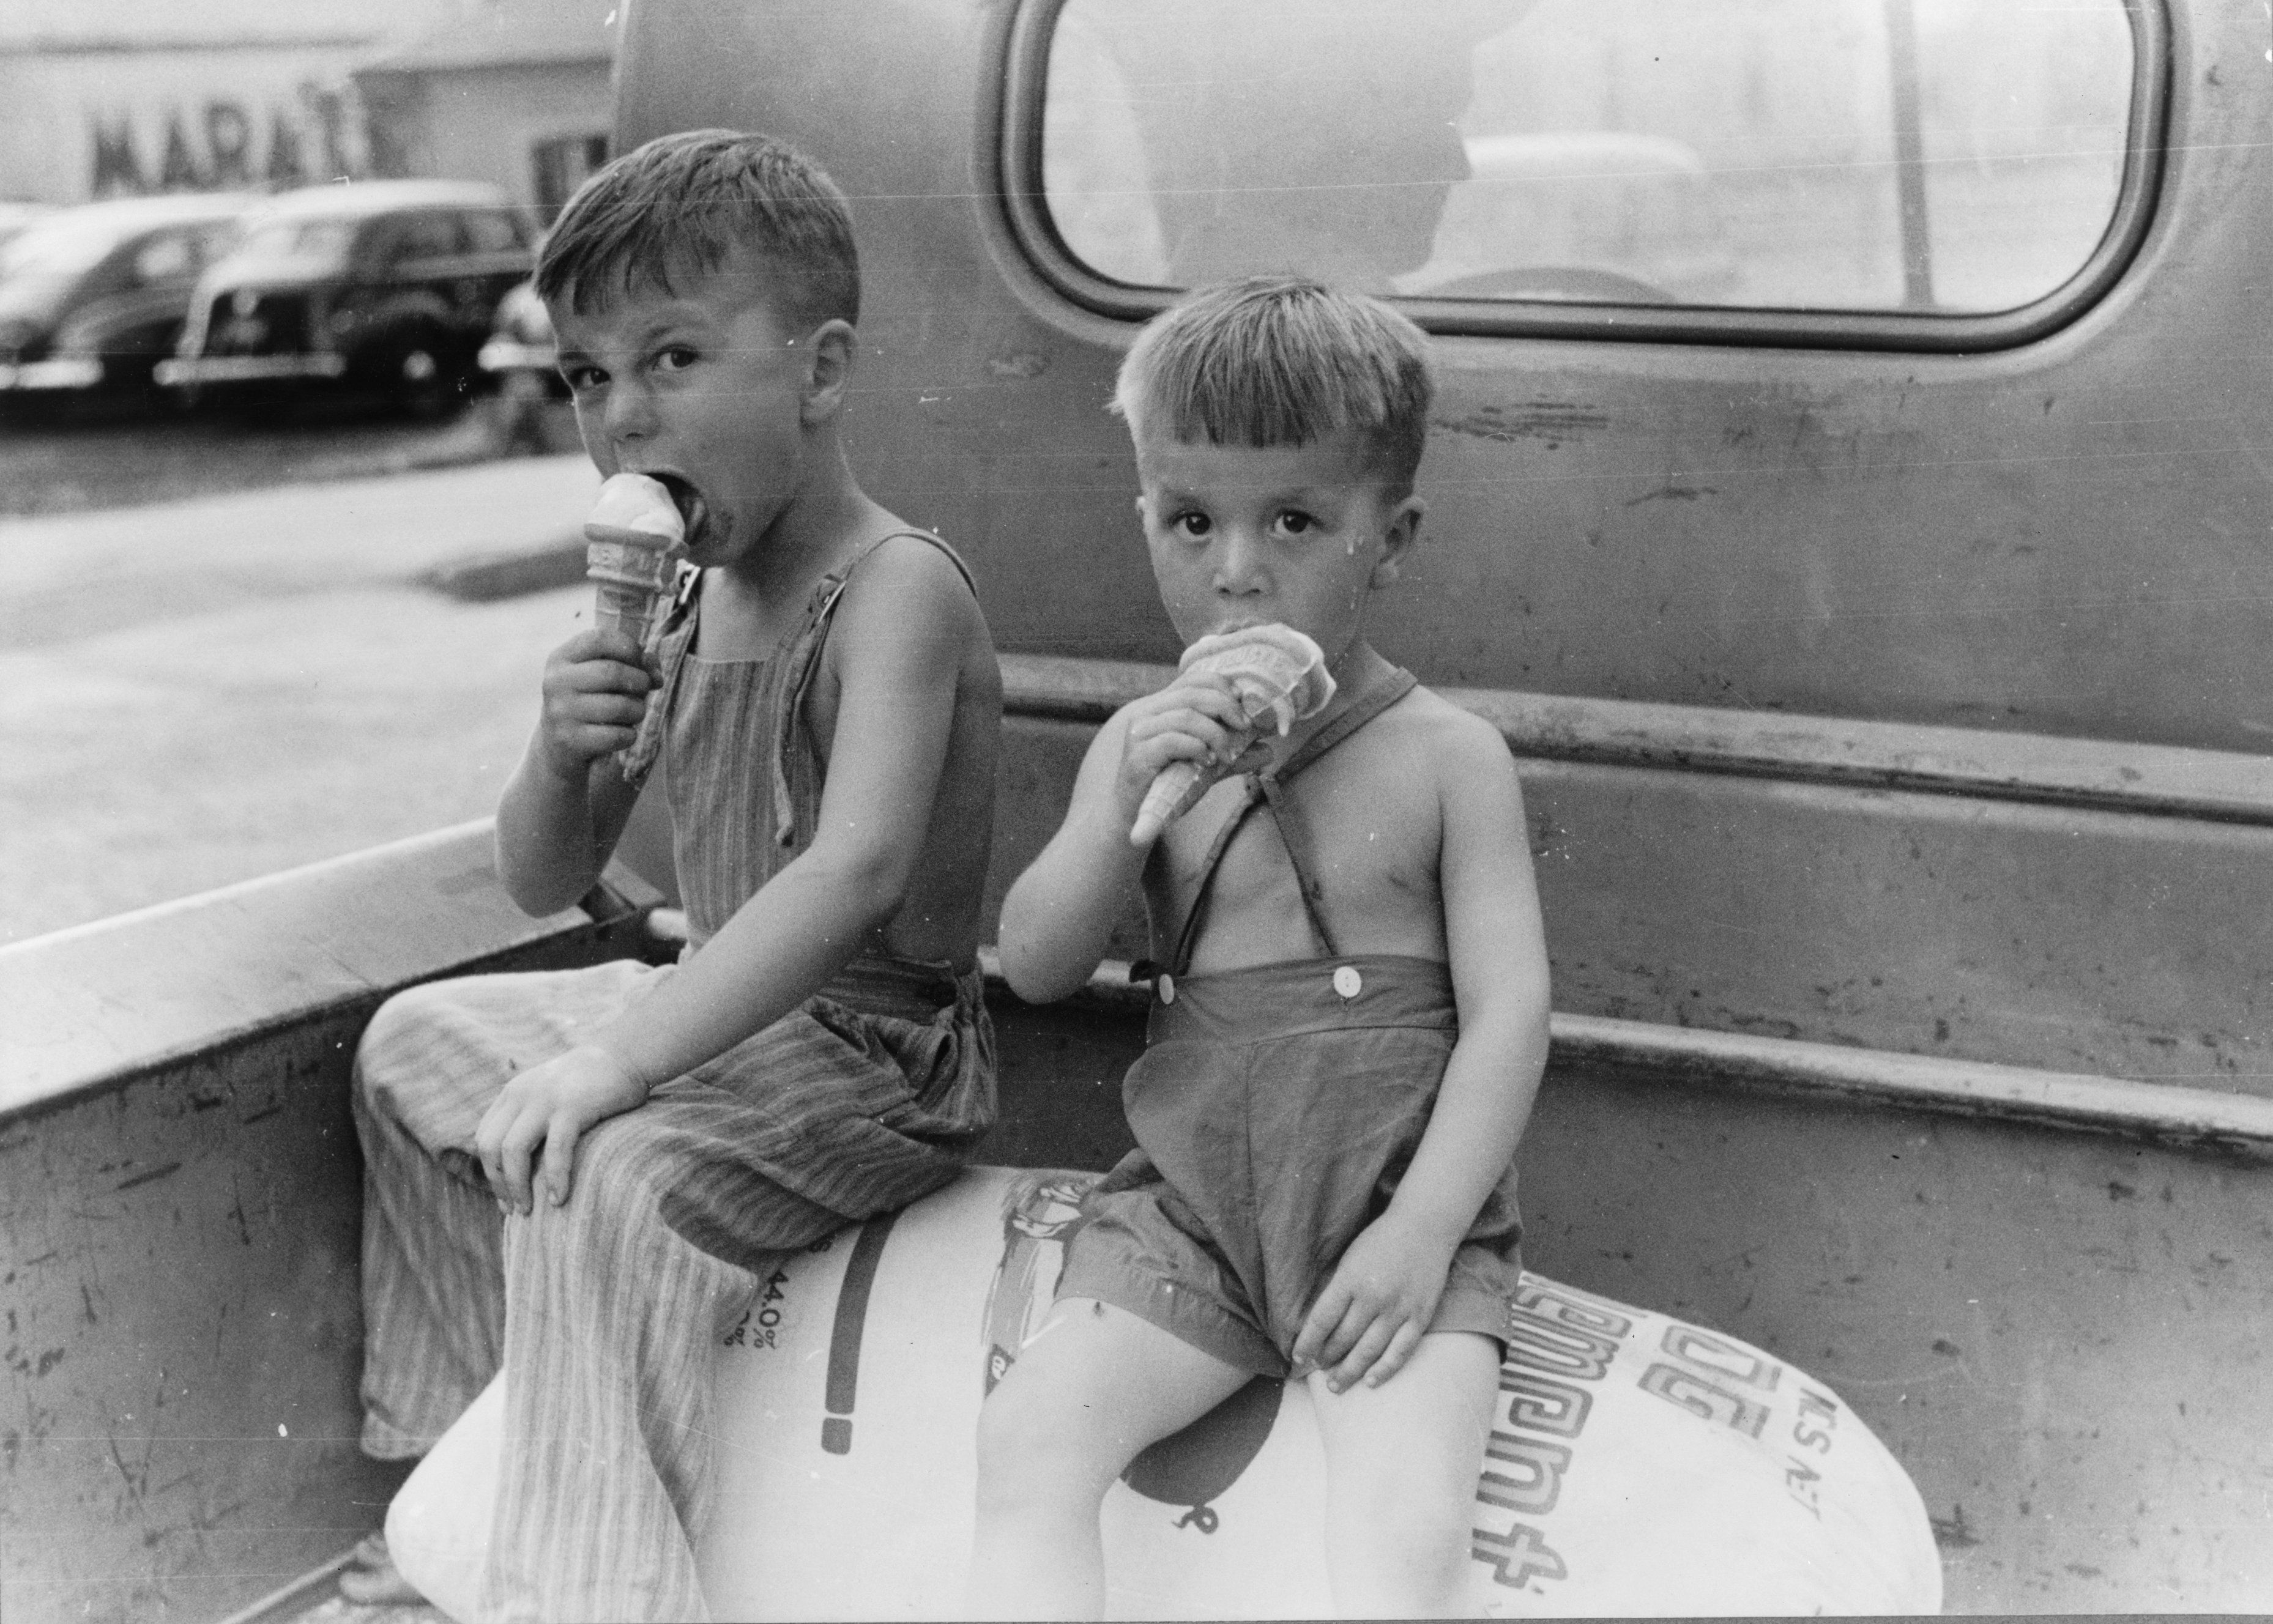 Farm Boys Eating Ice Cream Cones What A Treat